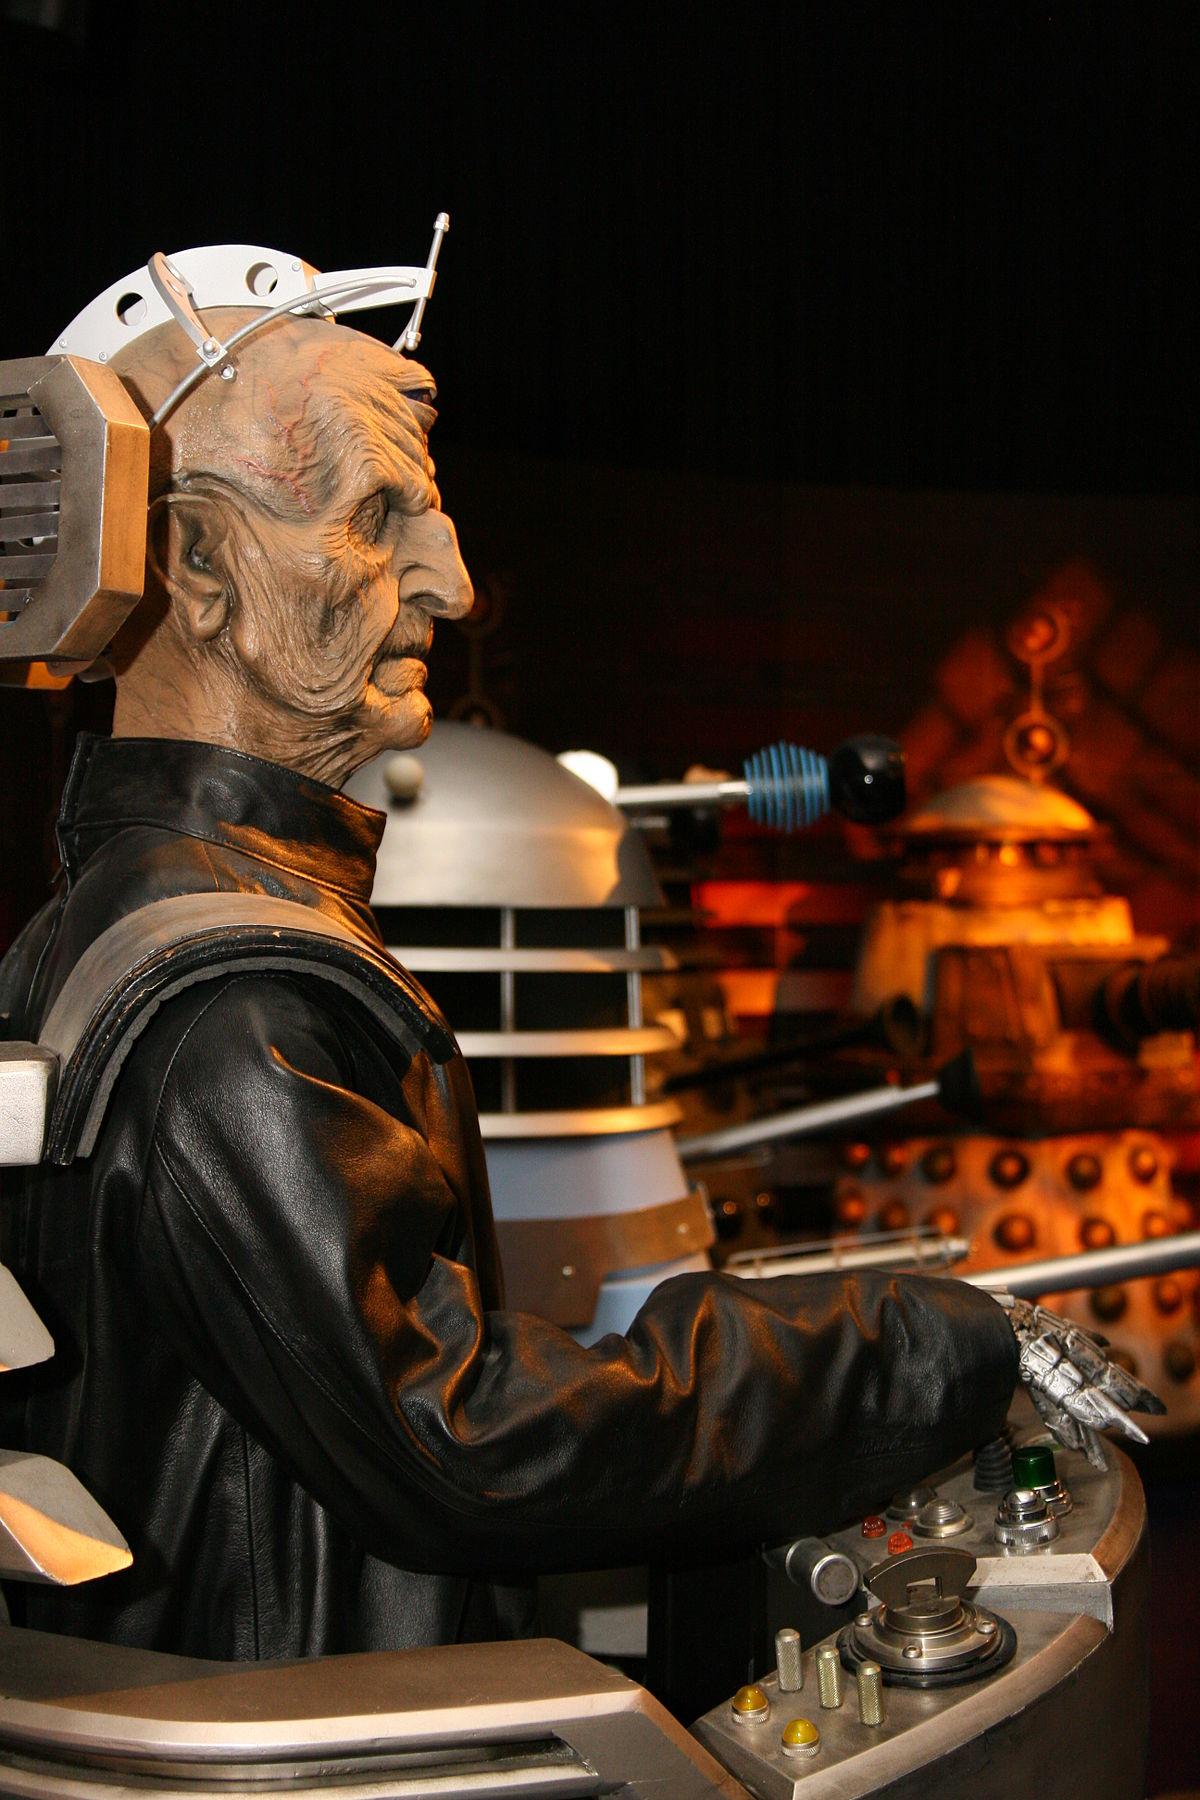 Evolution Of The Cybermen The Daleks - Wikiquote